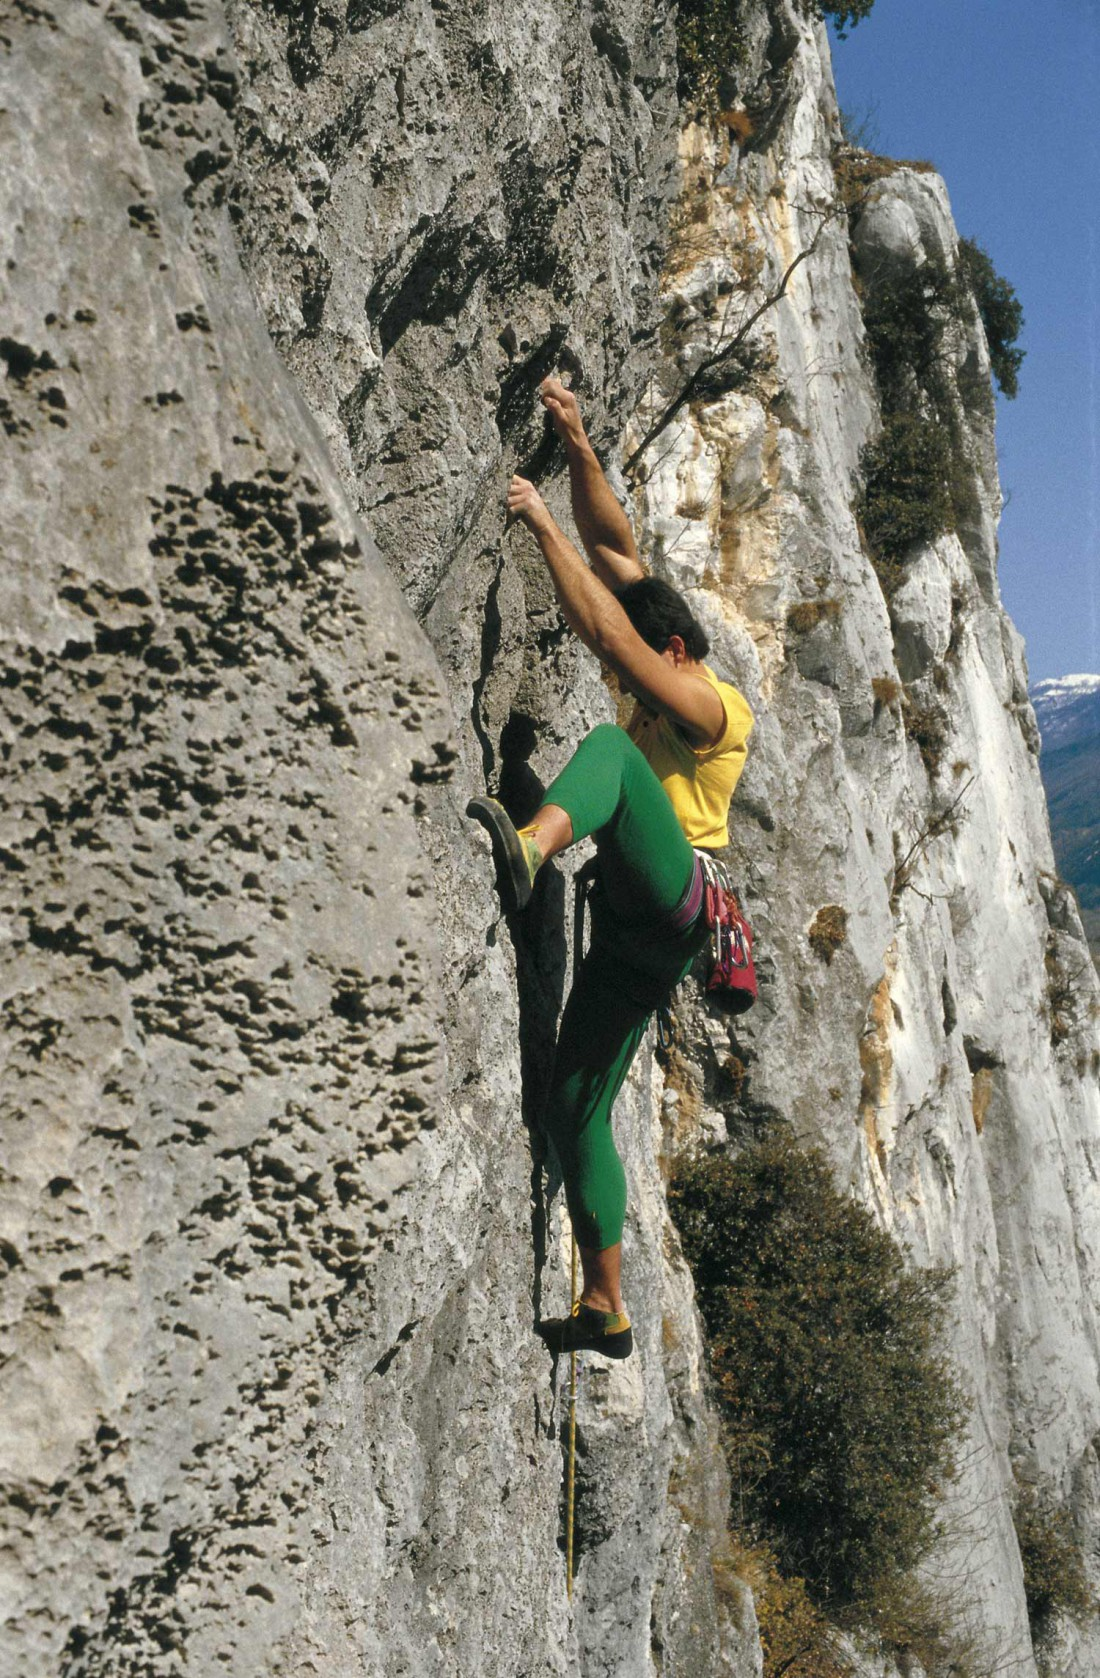 Vivi-Sport-Arrampicata-02-GZ-visitrovereto